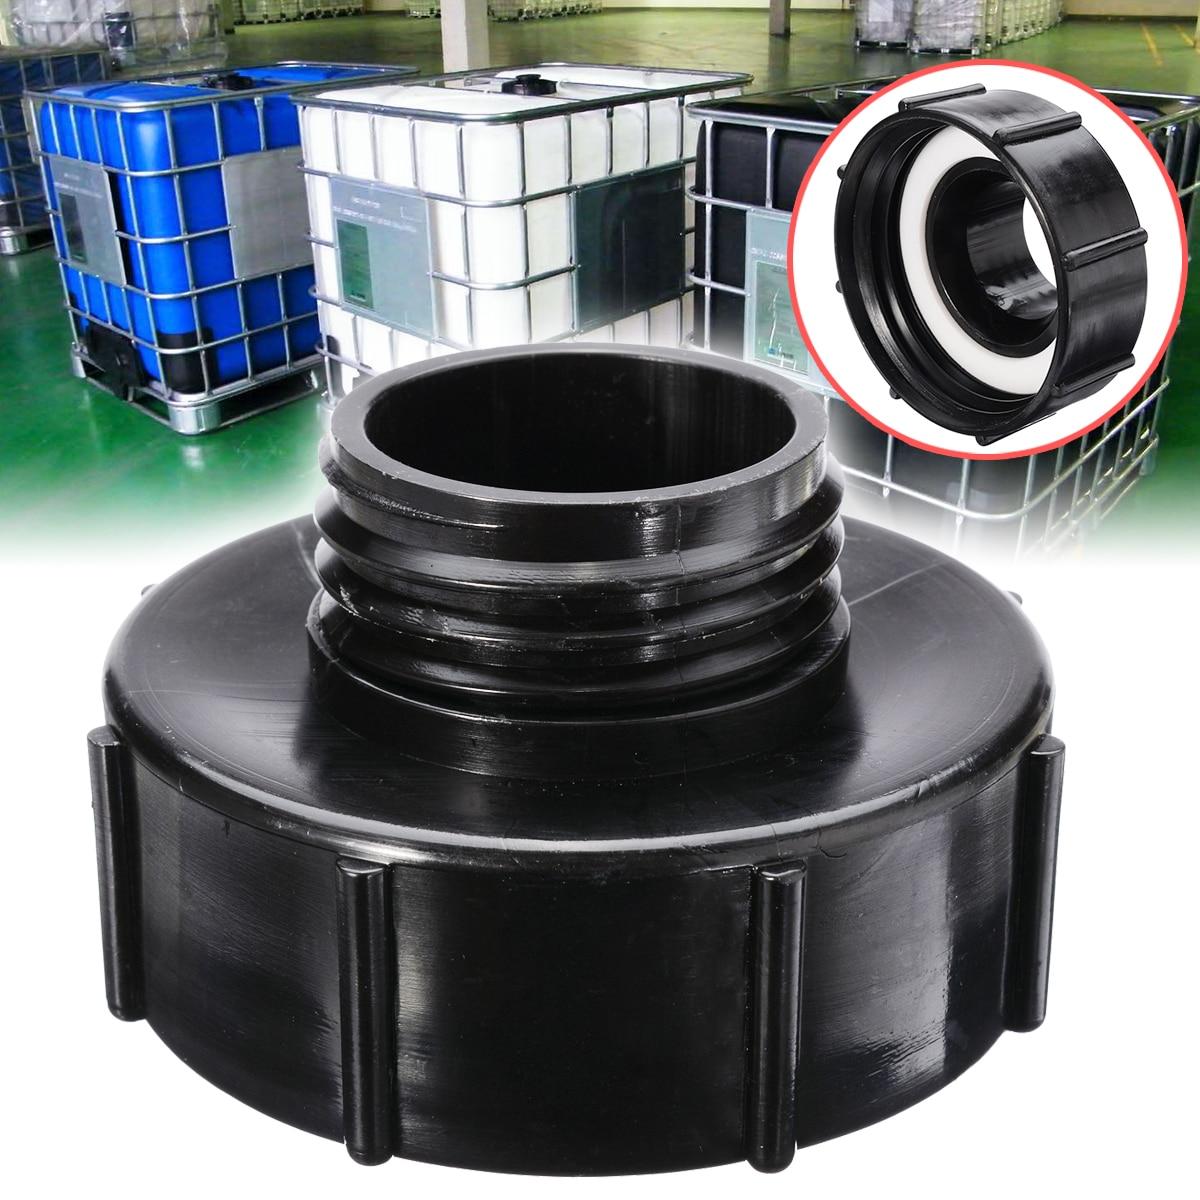 1/2 inch 3/4 inch 1 inch Thread IBC Tank Adapter Tap